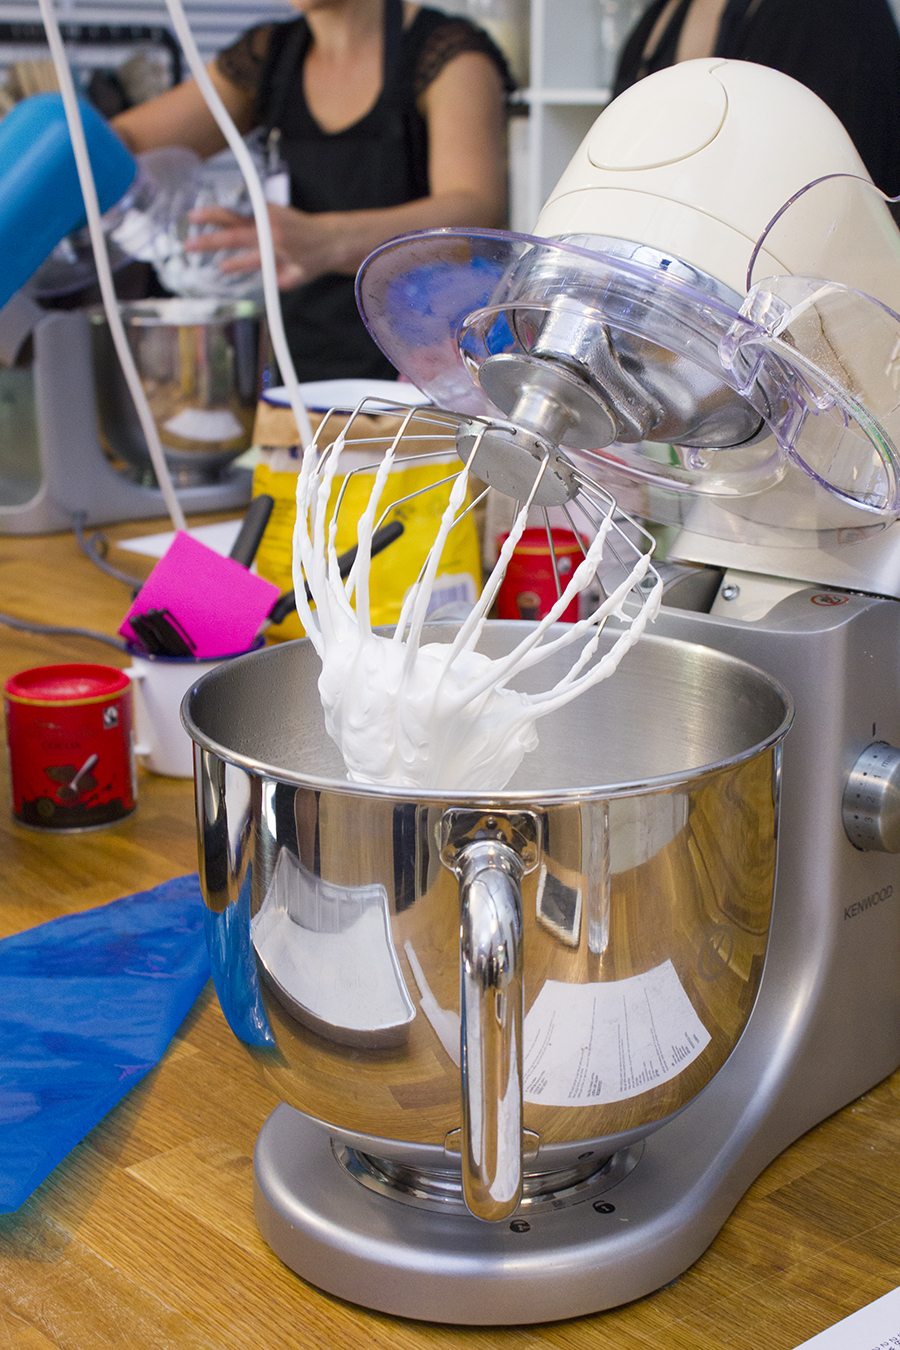 kenwood-kmix-kitchen-machine-baking-class